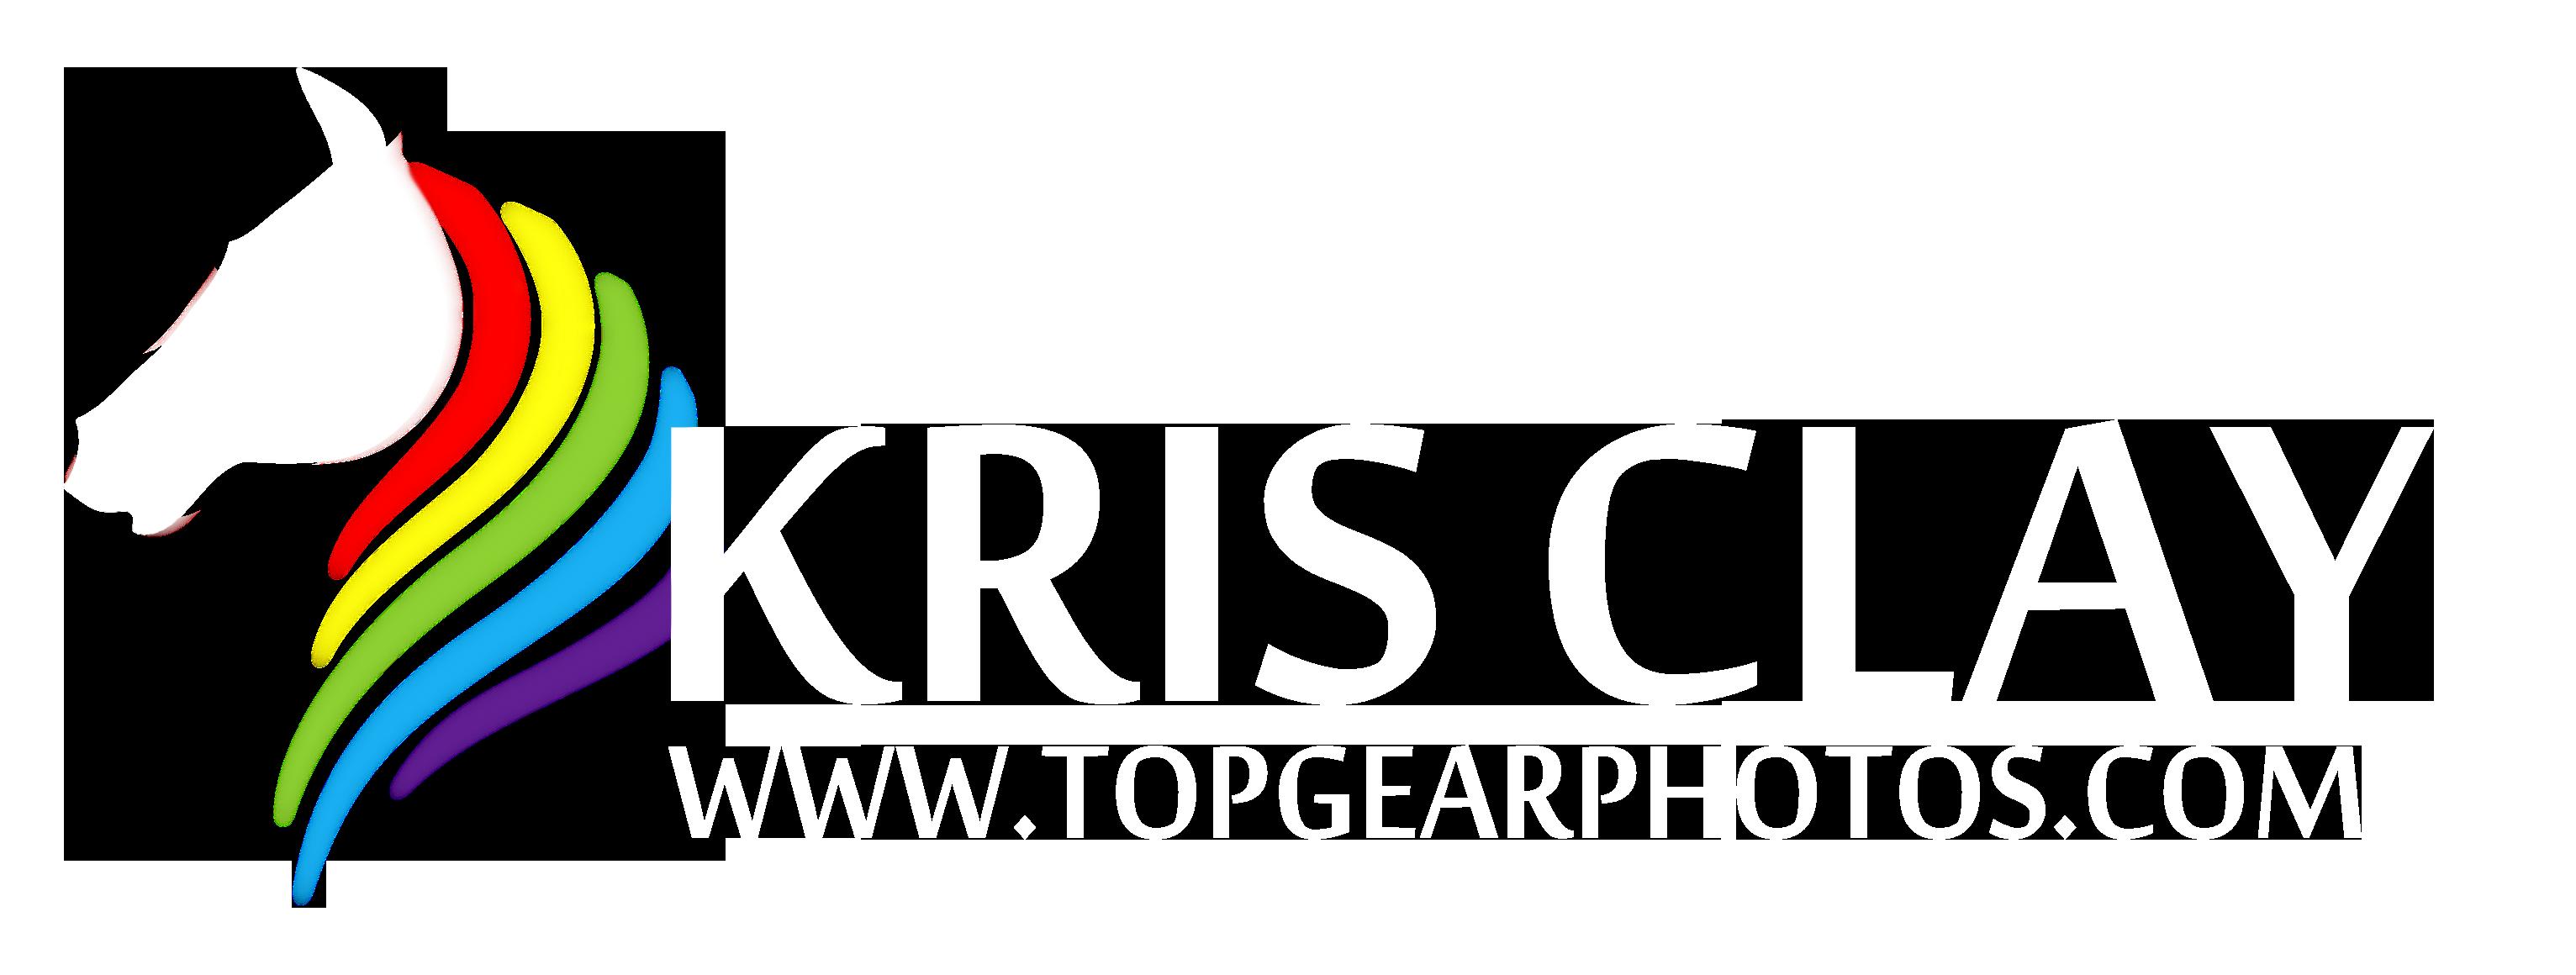 Topgearphotos